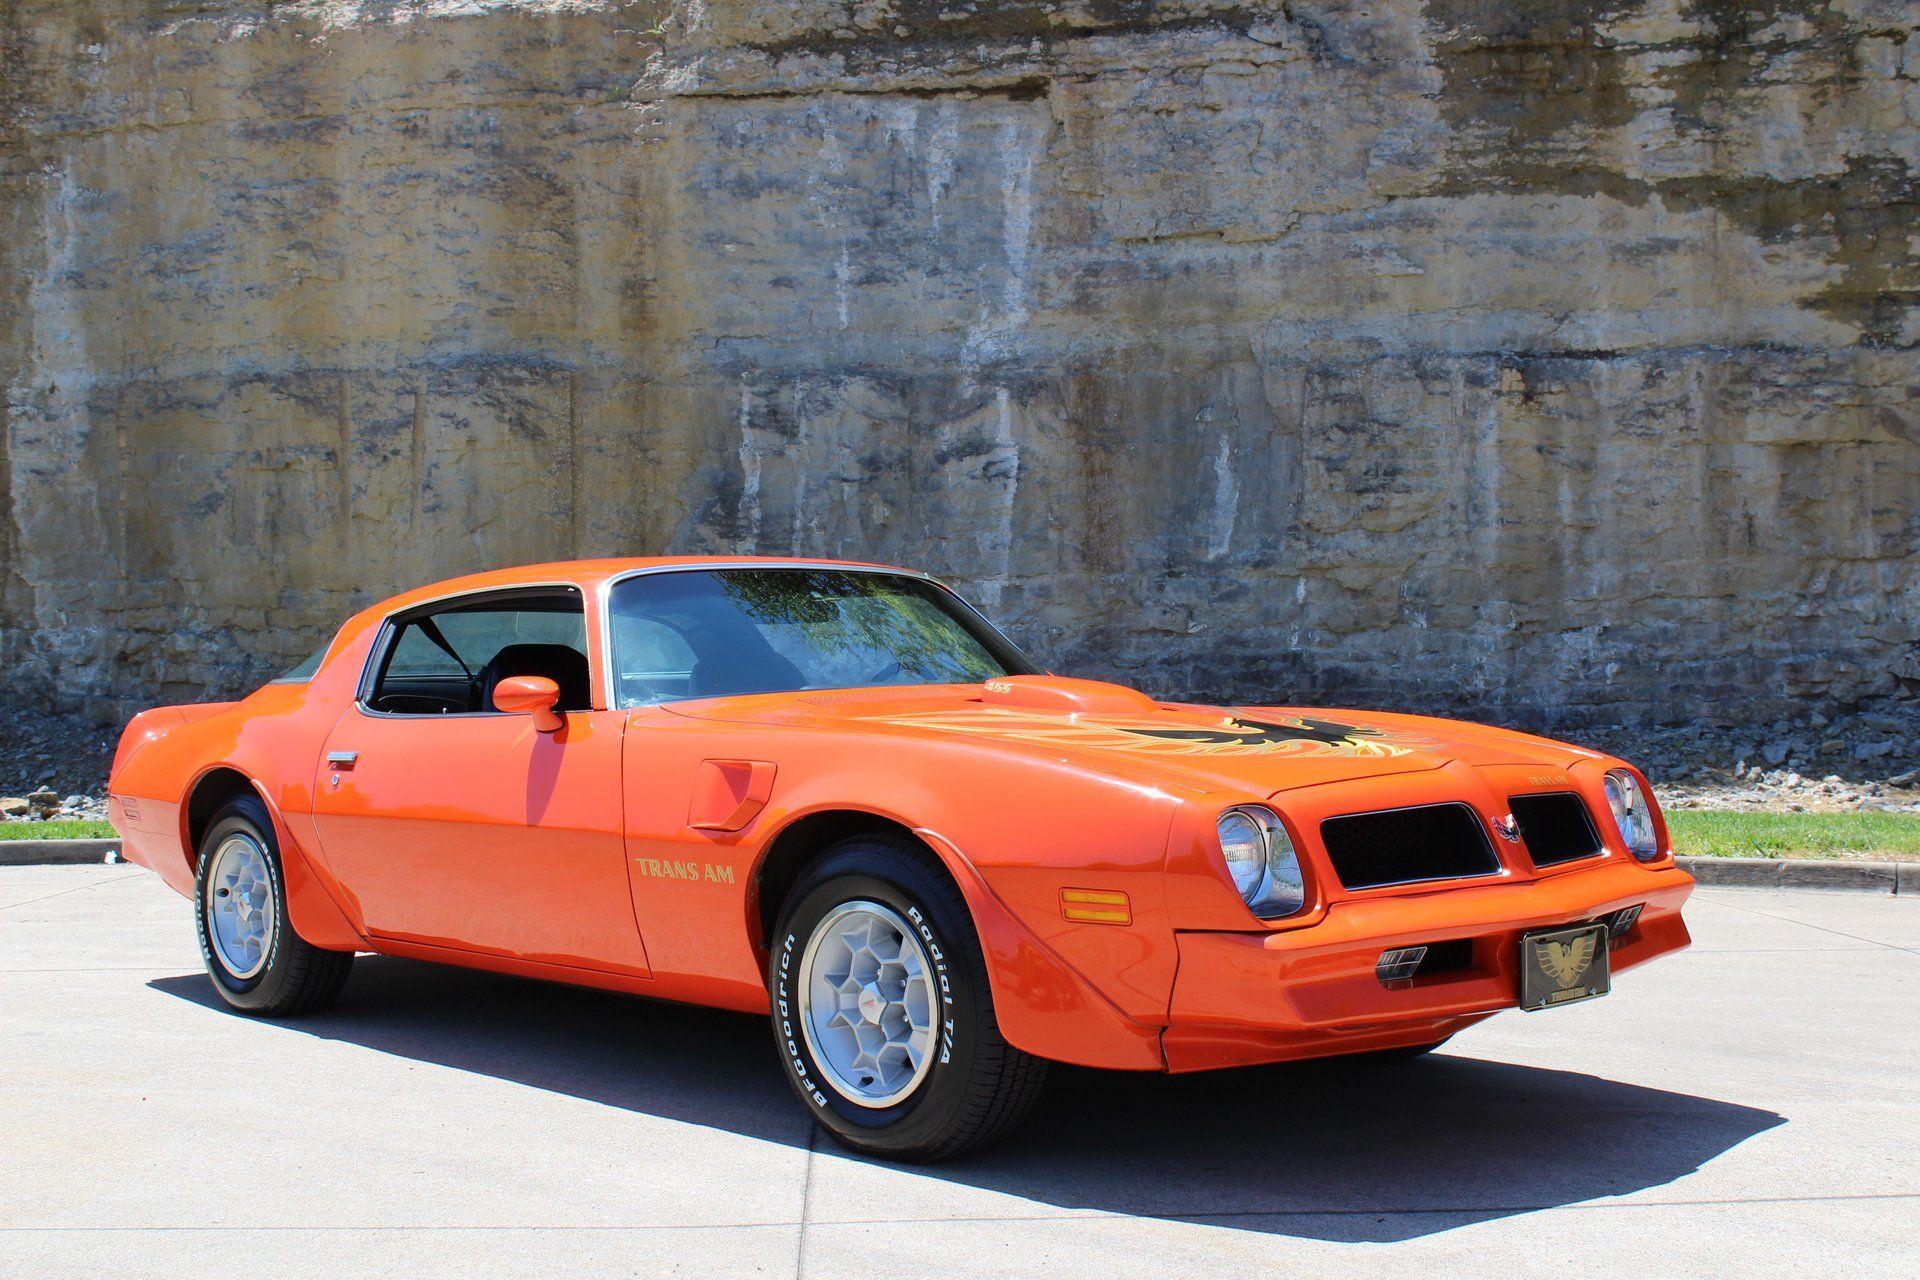 "<img src=""1976-pontiac-trans-am-firebird.jpeg"" alt=""An original low-mileage 1976 Pontiac Trans Am"">"